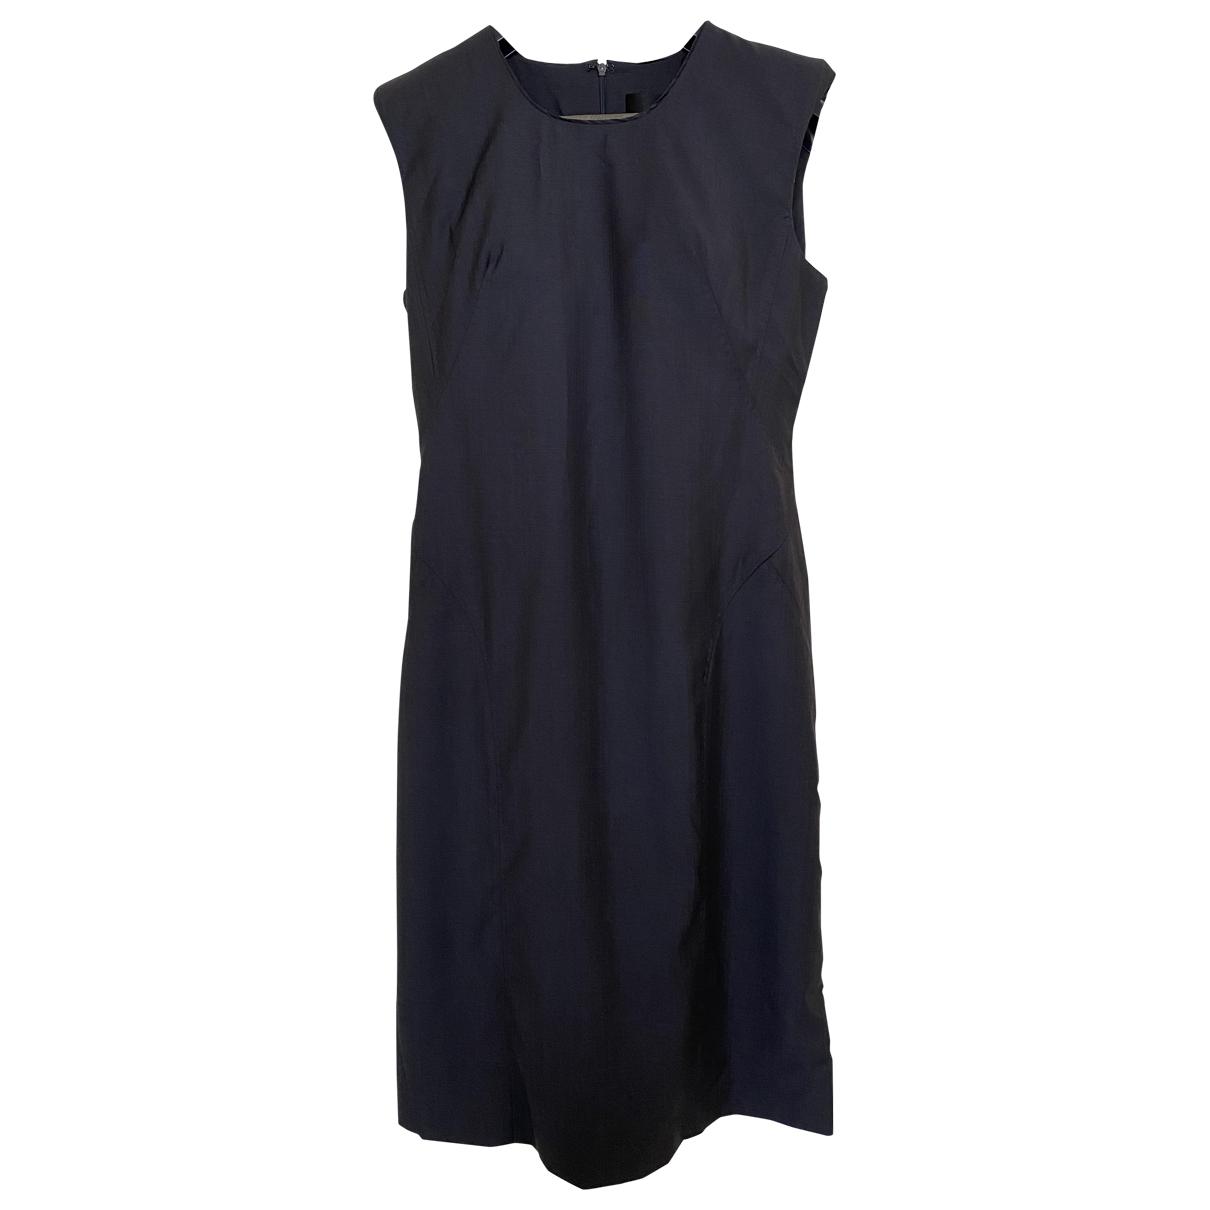 Amanda Wakeley \N Navy Wool dress for Women 14 UK